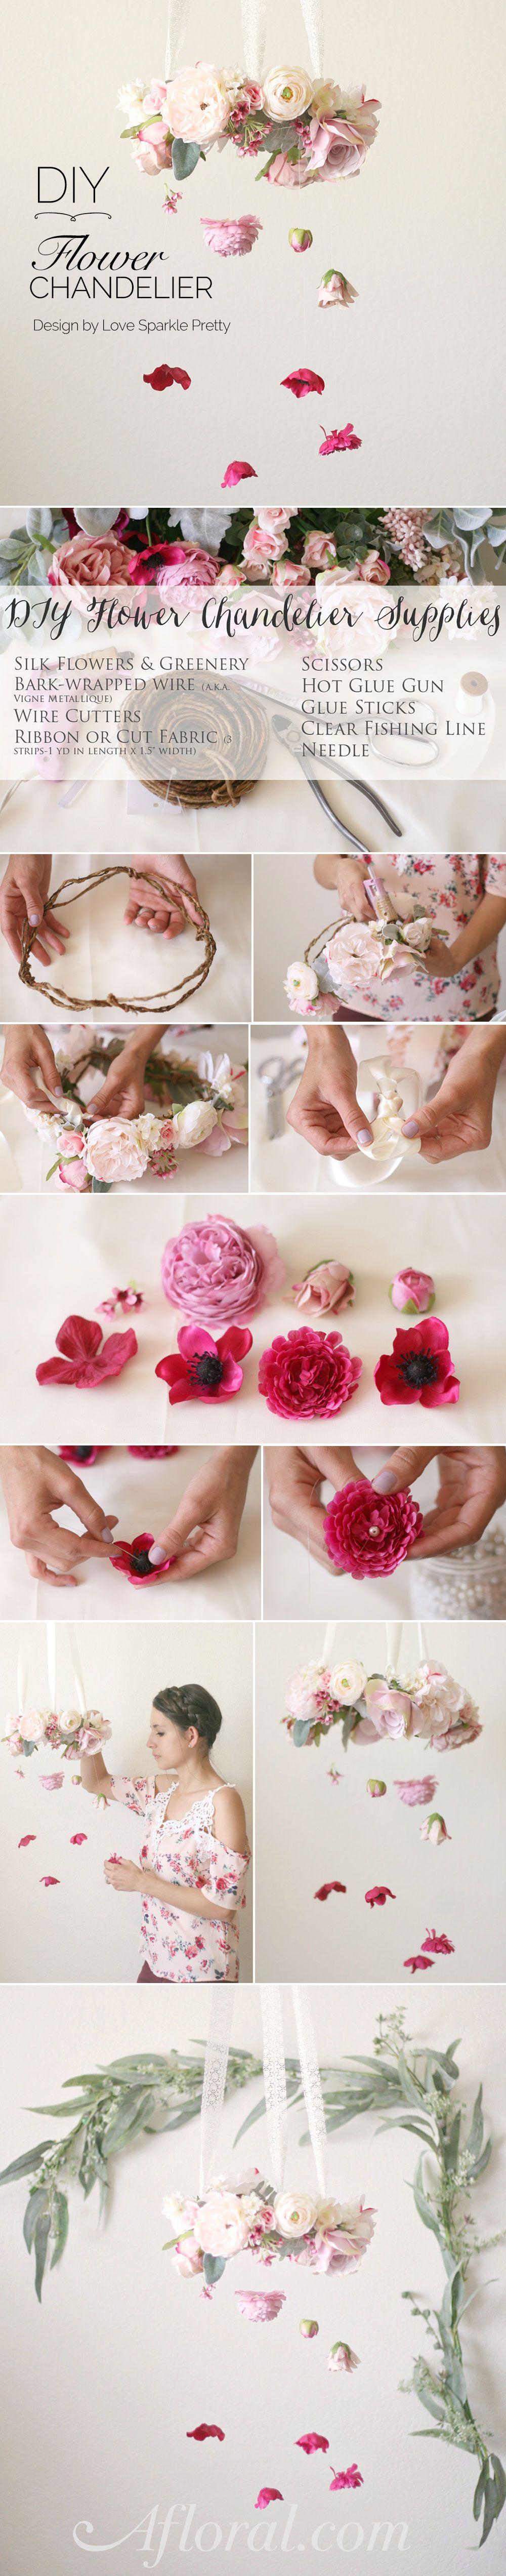 How To DIY Flower Chandelier  데코, 꽃장식 및 꽃